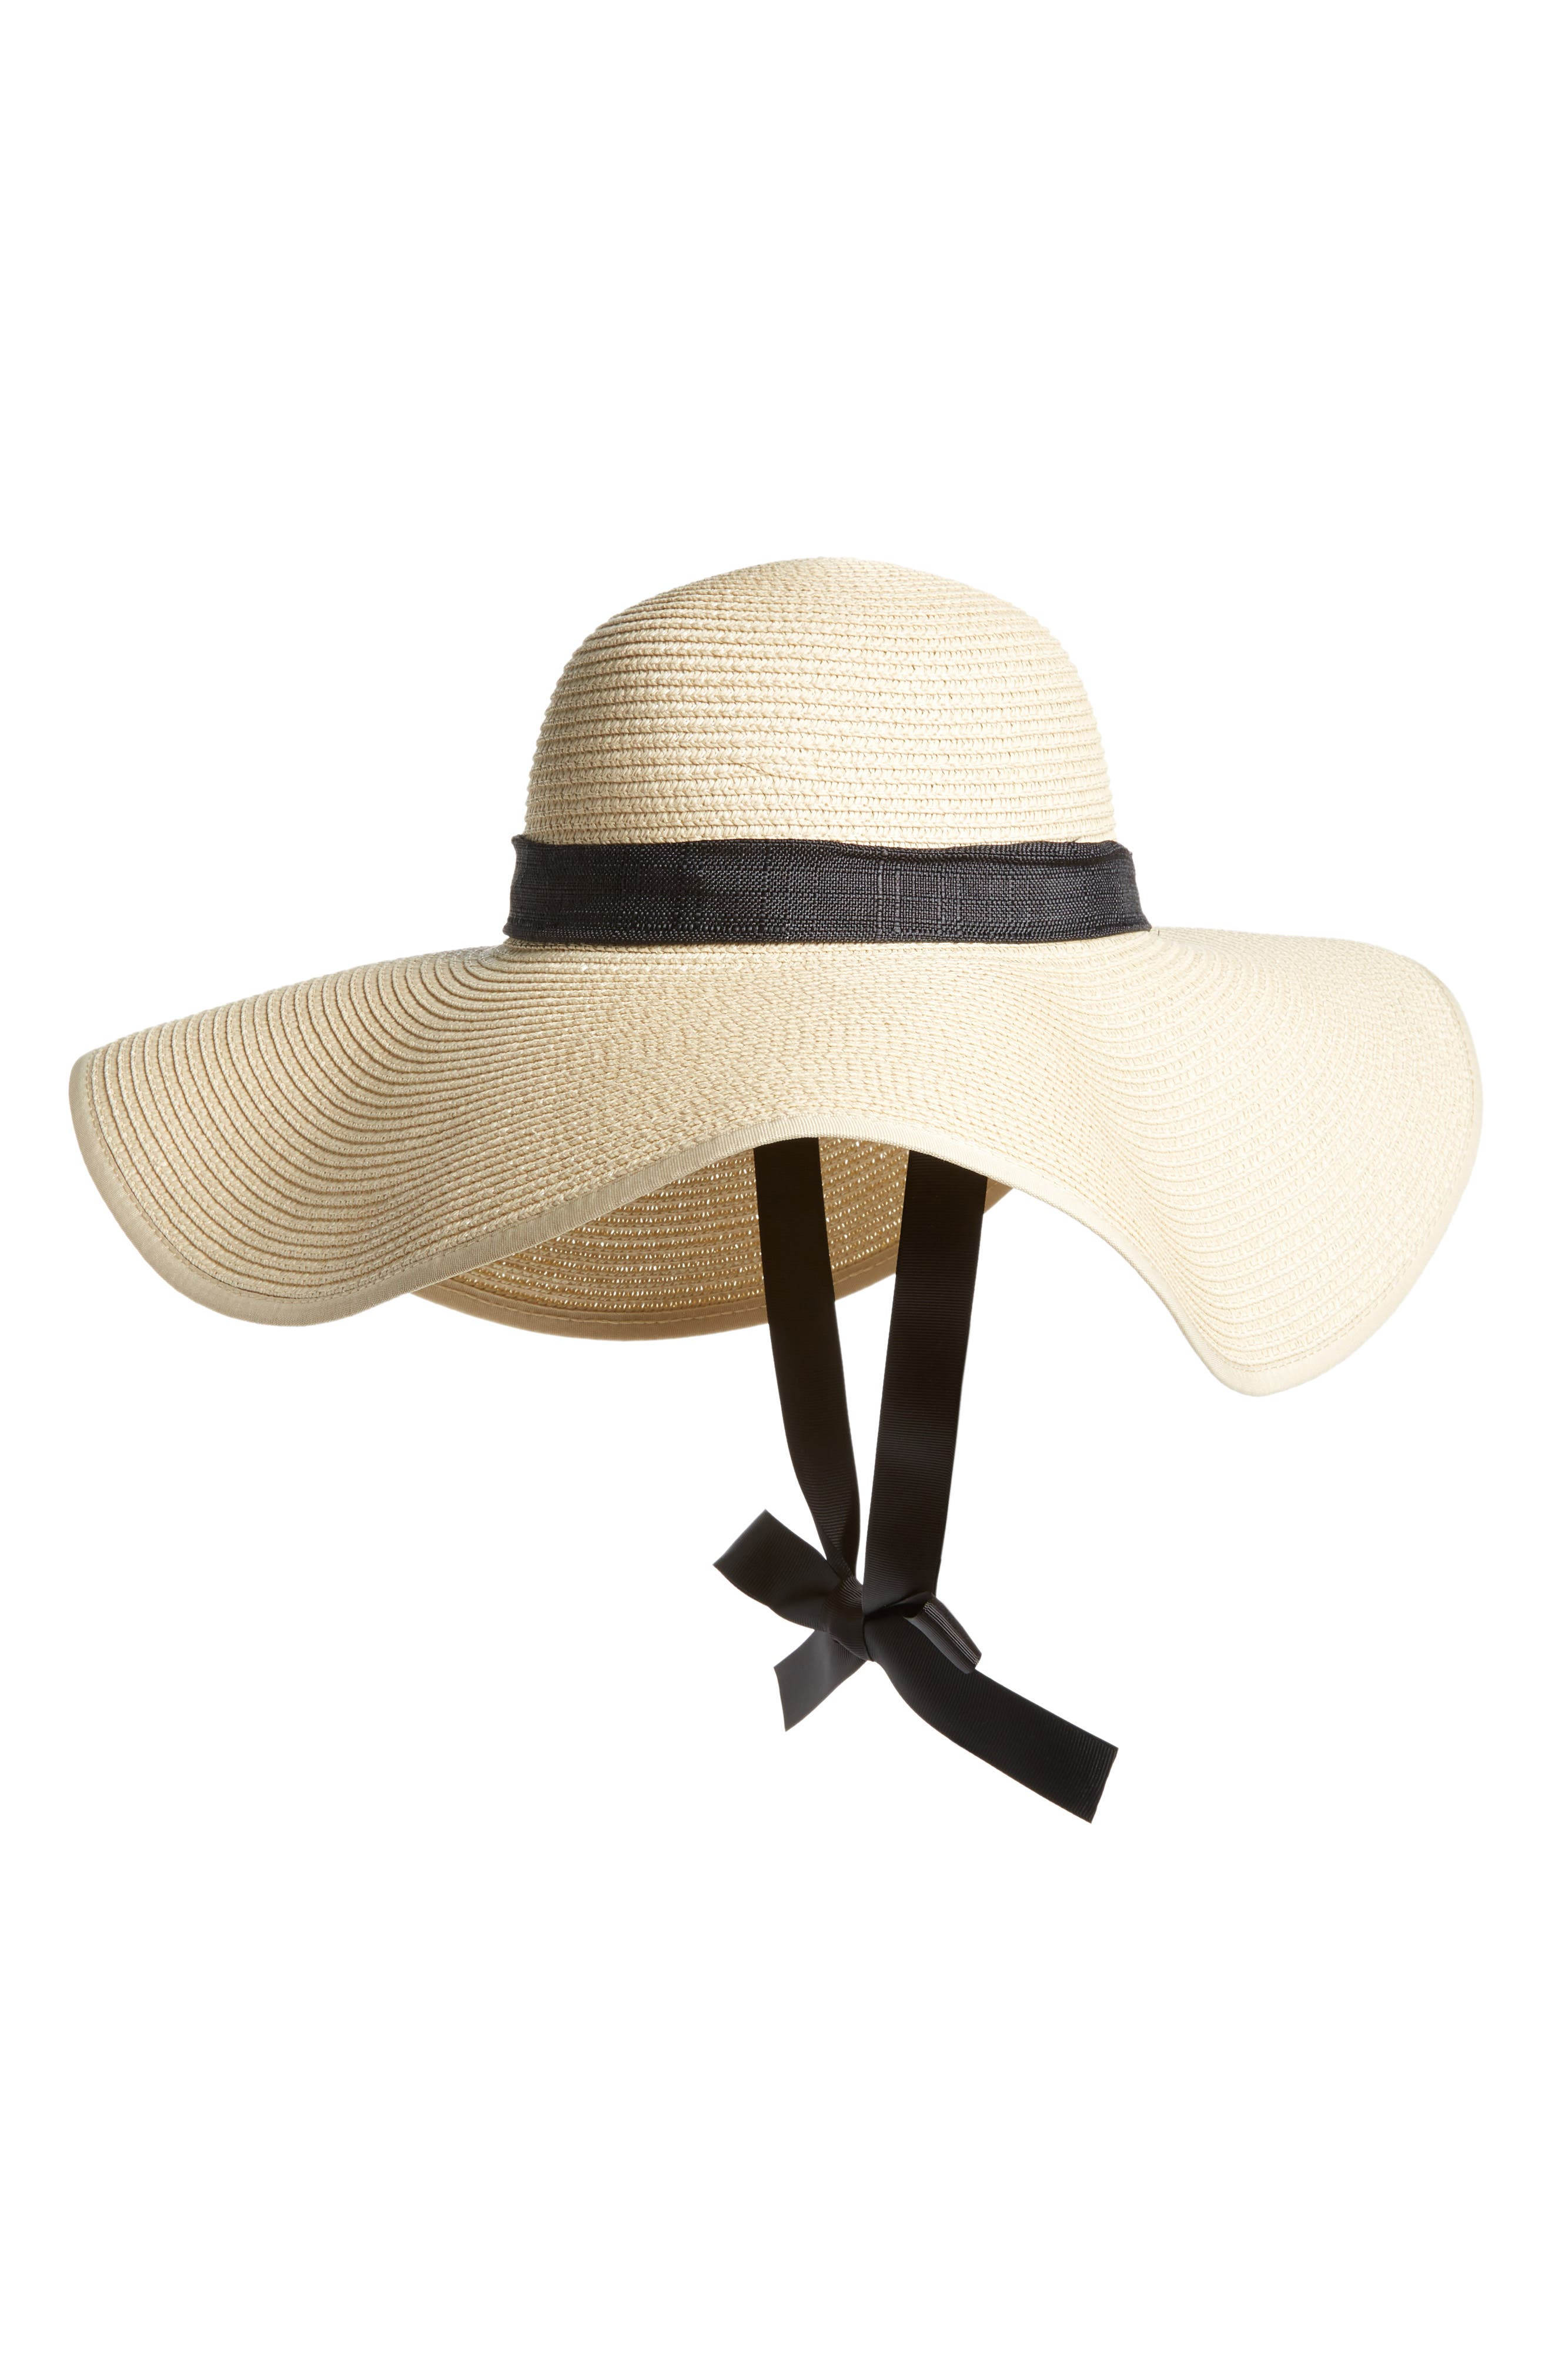 Tie Neck Ribbon Floppy Straw Hat,                         Main,                         color, Black/ Natural